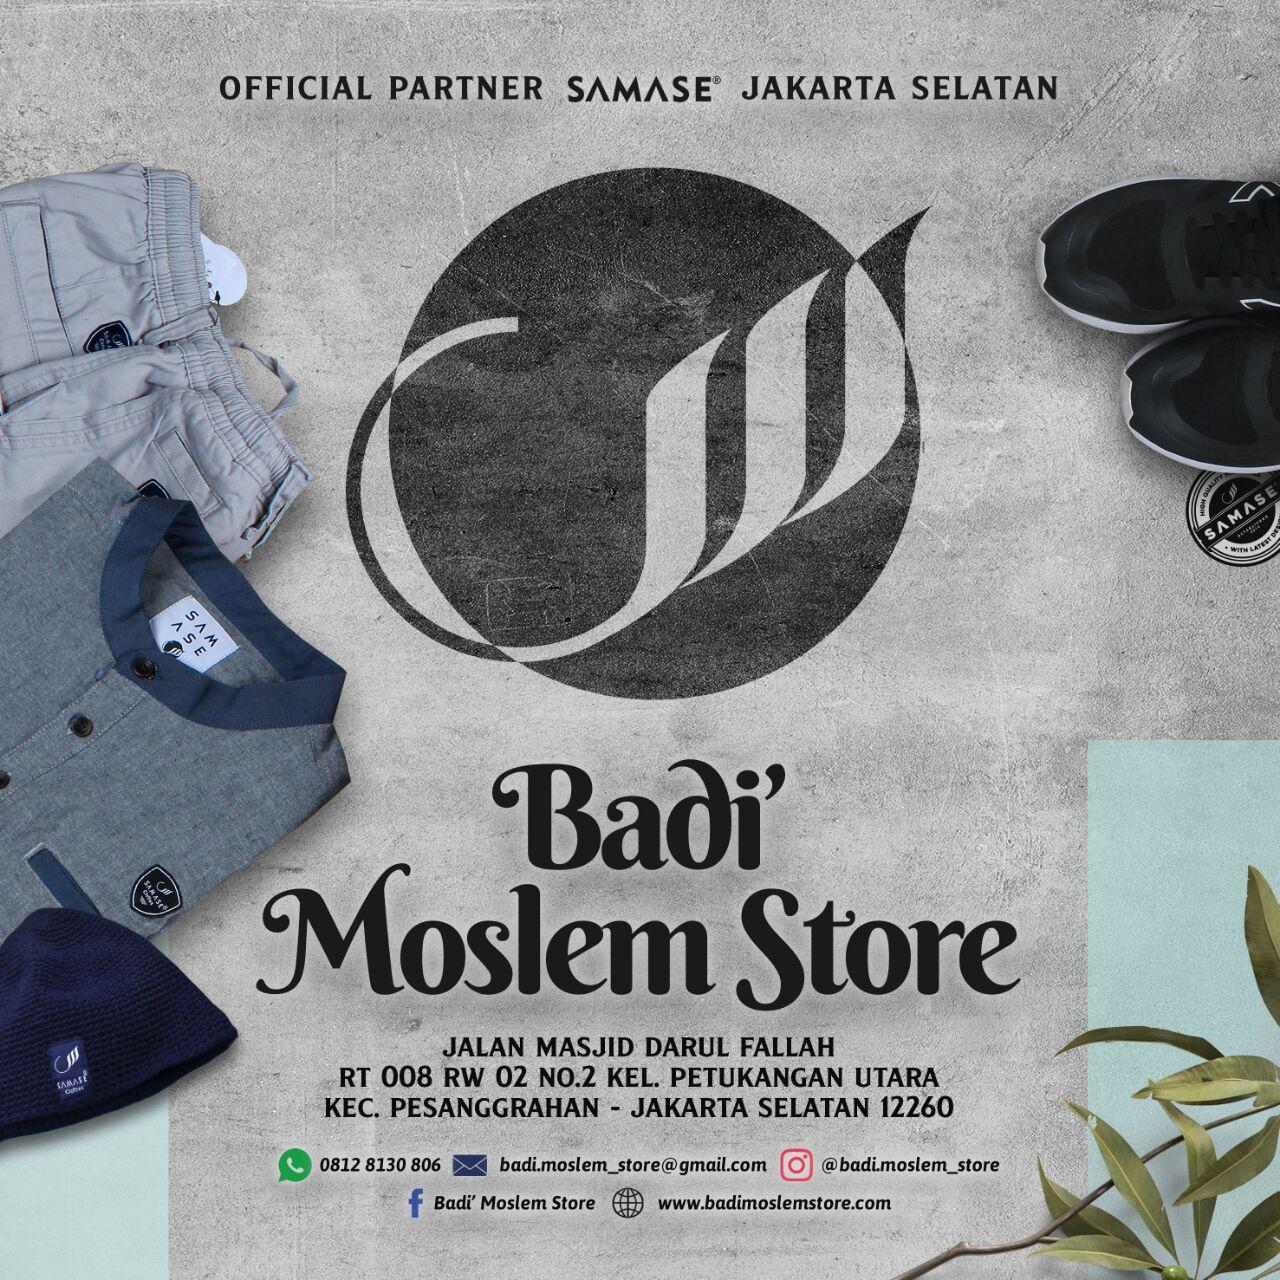 Distributor Samase Jakarta